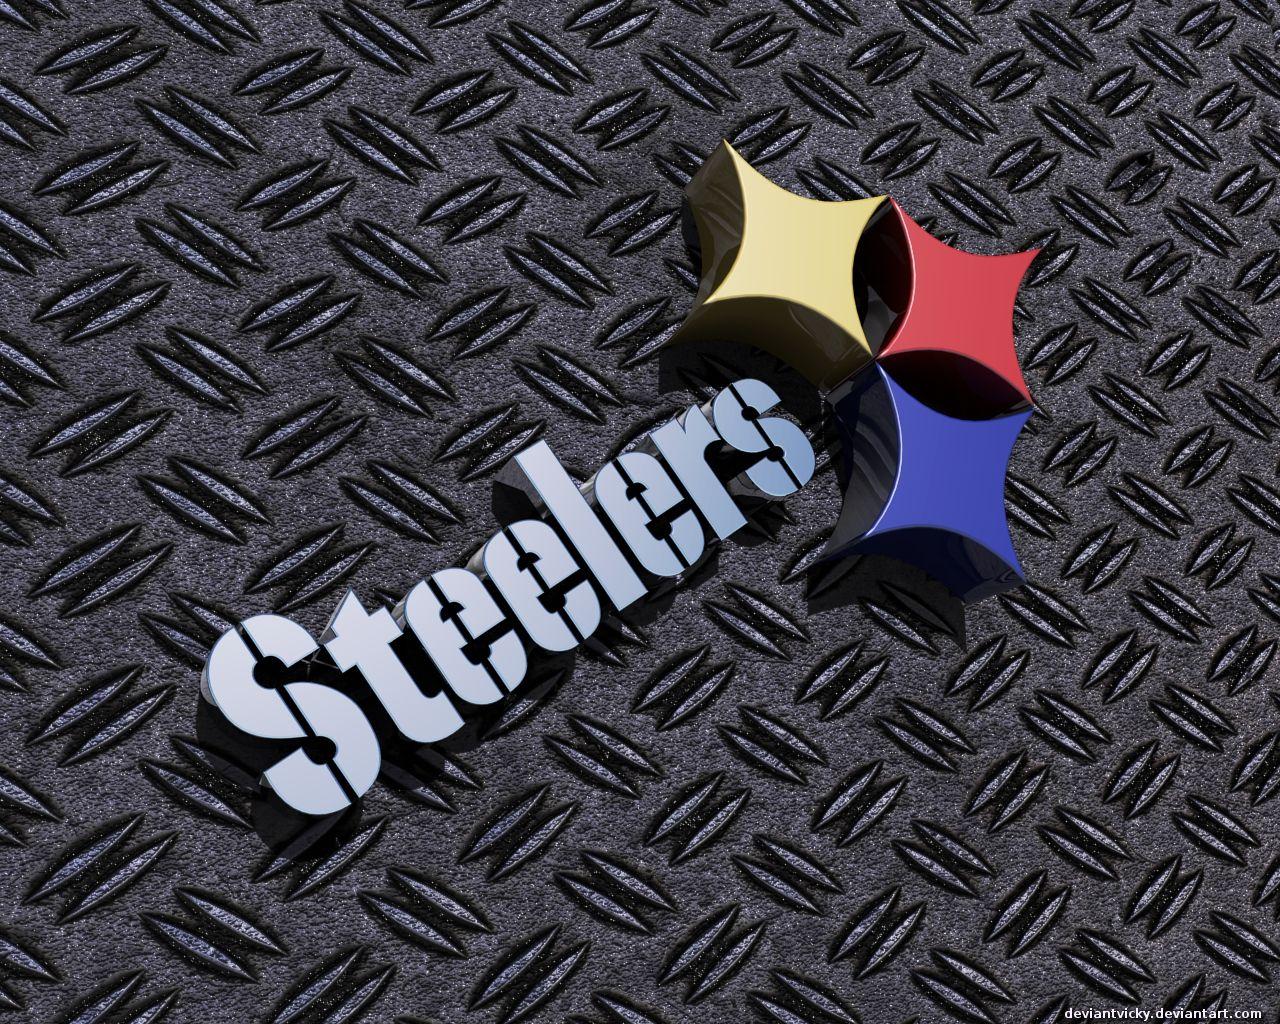 Steelers 3d Wallpaper Steelers 3d By Deviantvicky 1280 X 1024 Pittsburgh Steelers Logo Pittsburg Steelers Pittsburgh Steelers Football